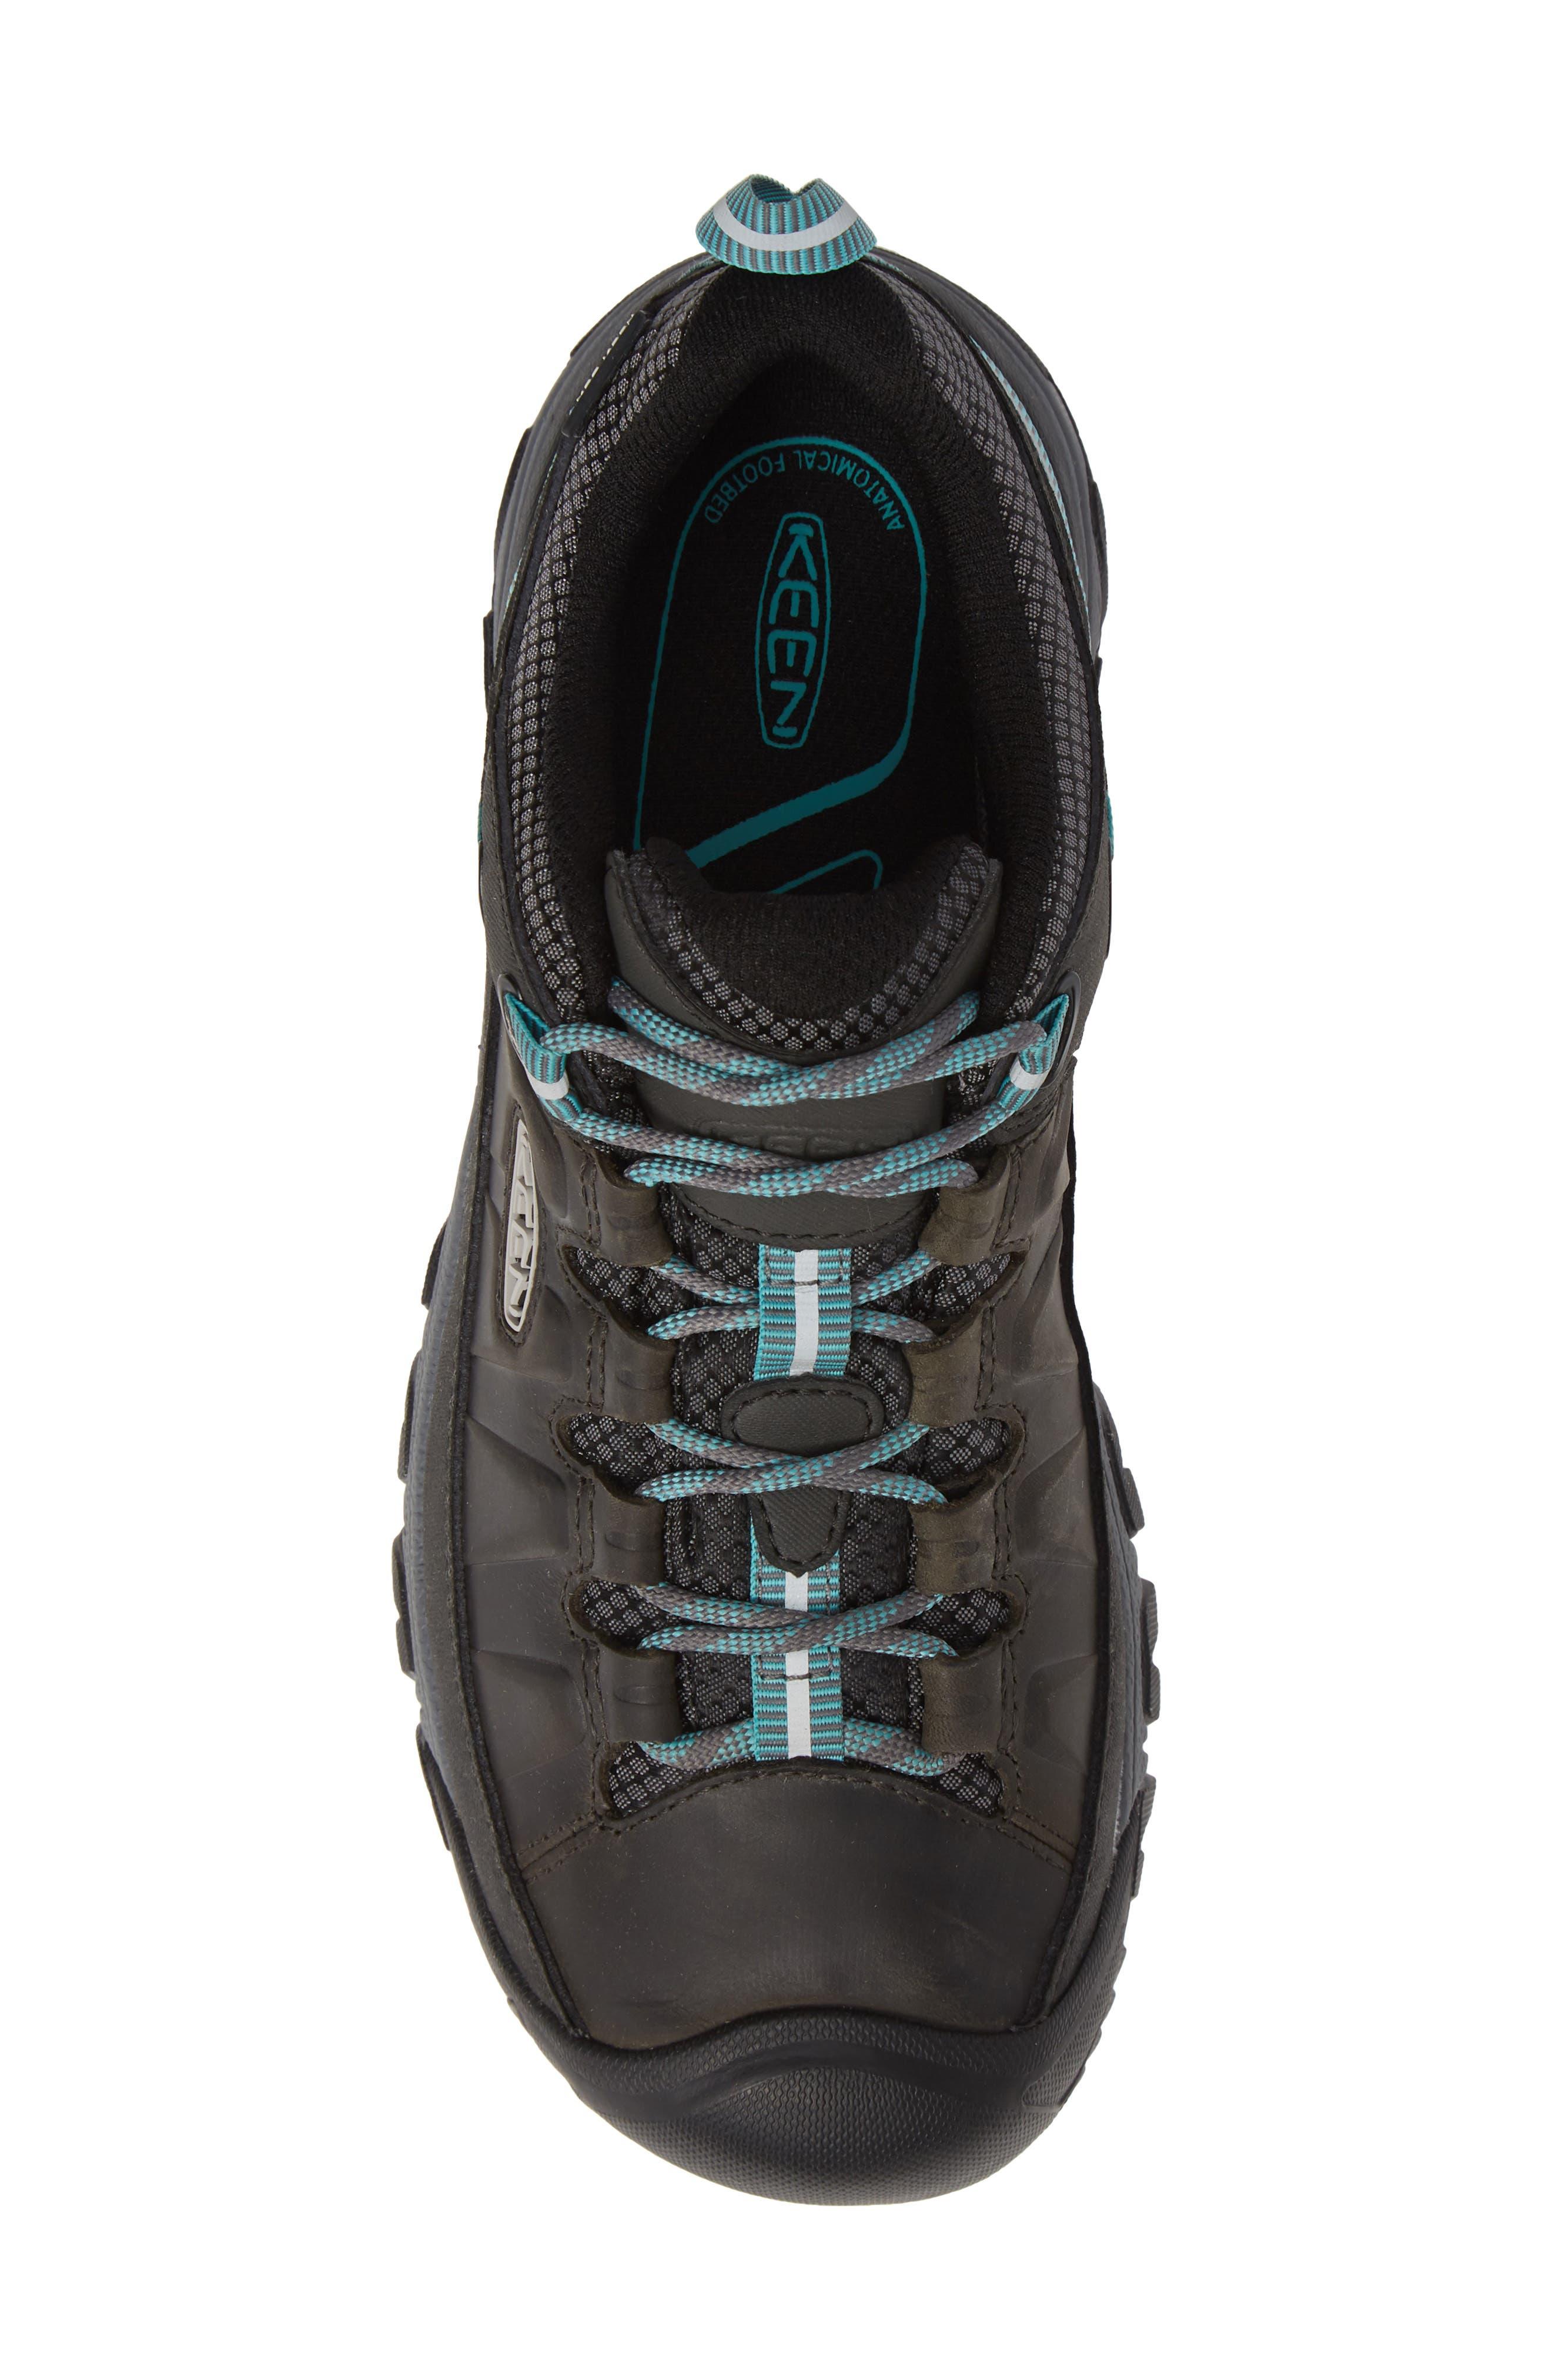 Targhee III Waterproof Hiking Shoe,                             Alternate thumbnail 5, color,                             ALCATRAZ/ TURQUOISE LEATHER